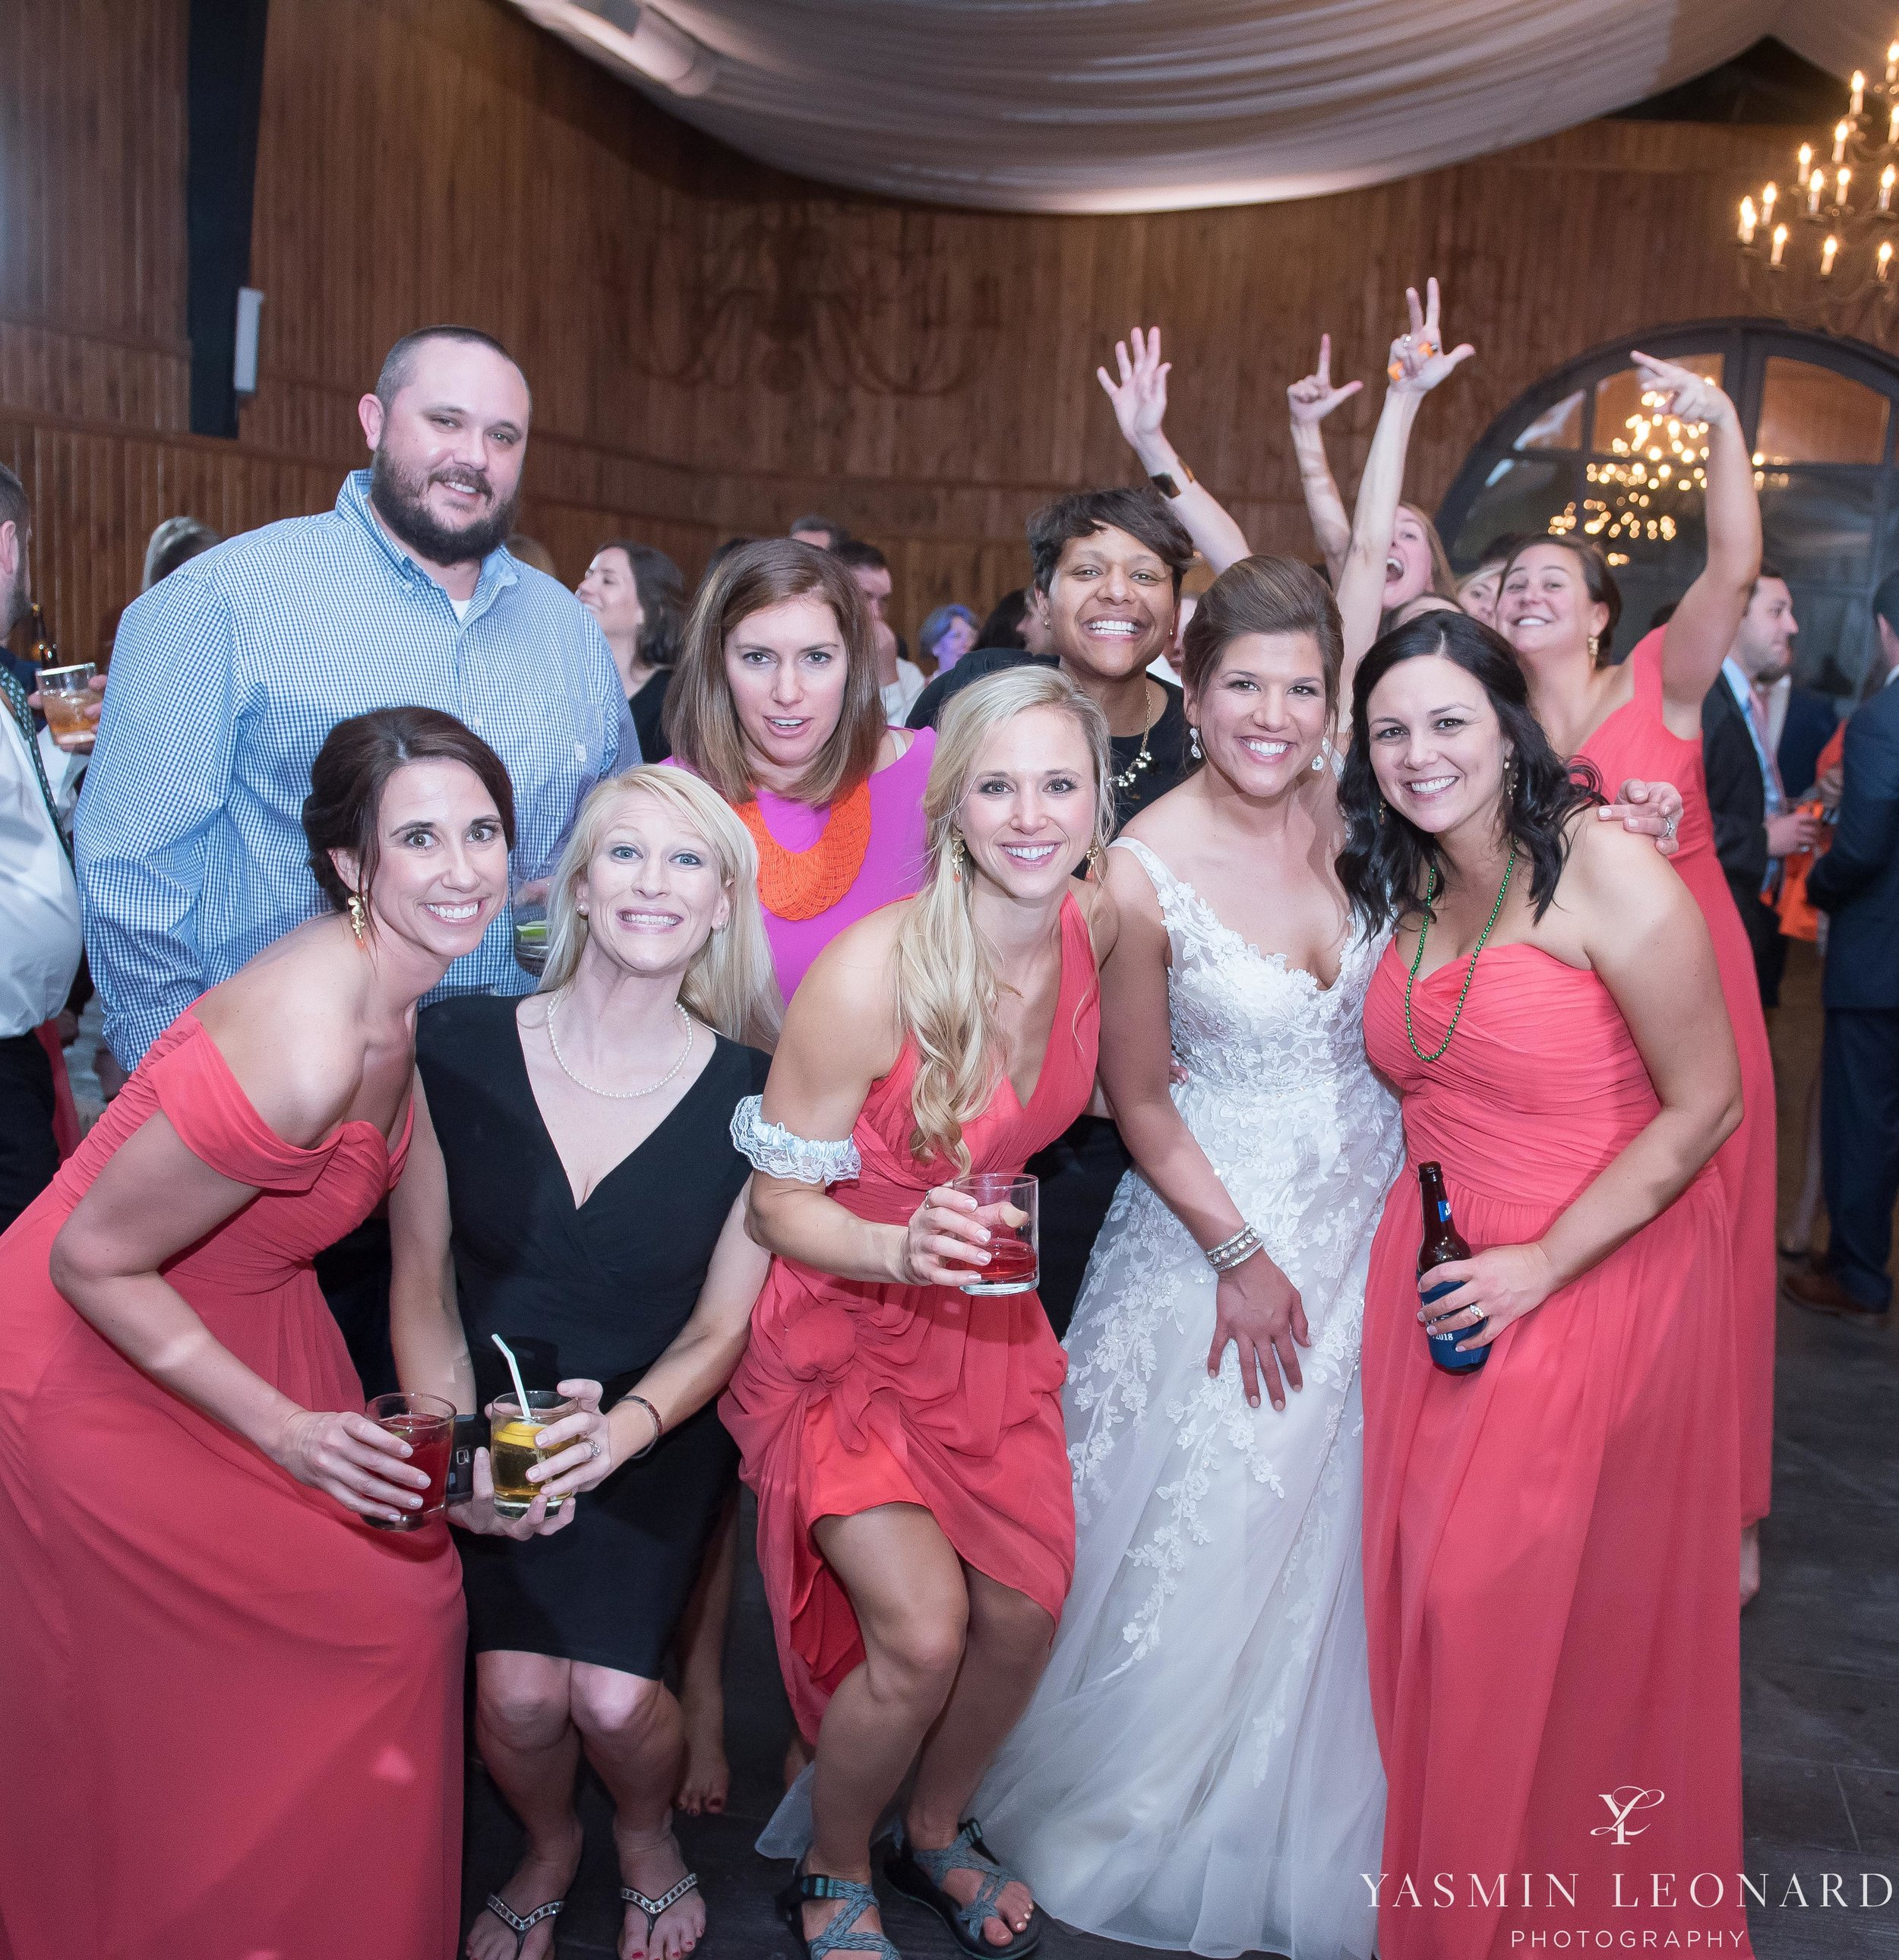 Adaumont Farm - Adaumont Farm Weddings - Trinity Weddings - NC Weddings - Yasmin Leonard Photography-102.jpg